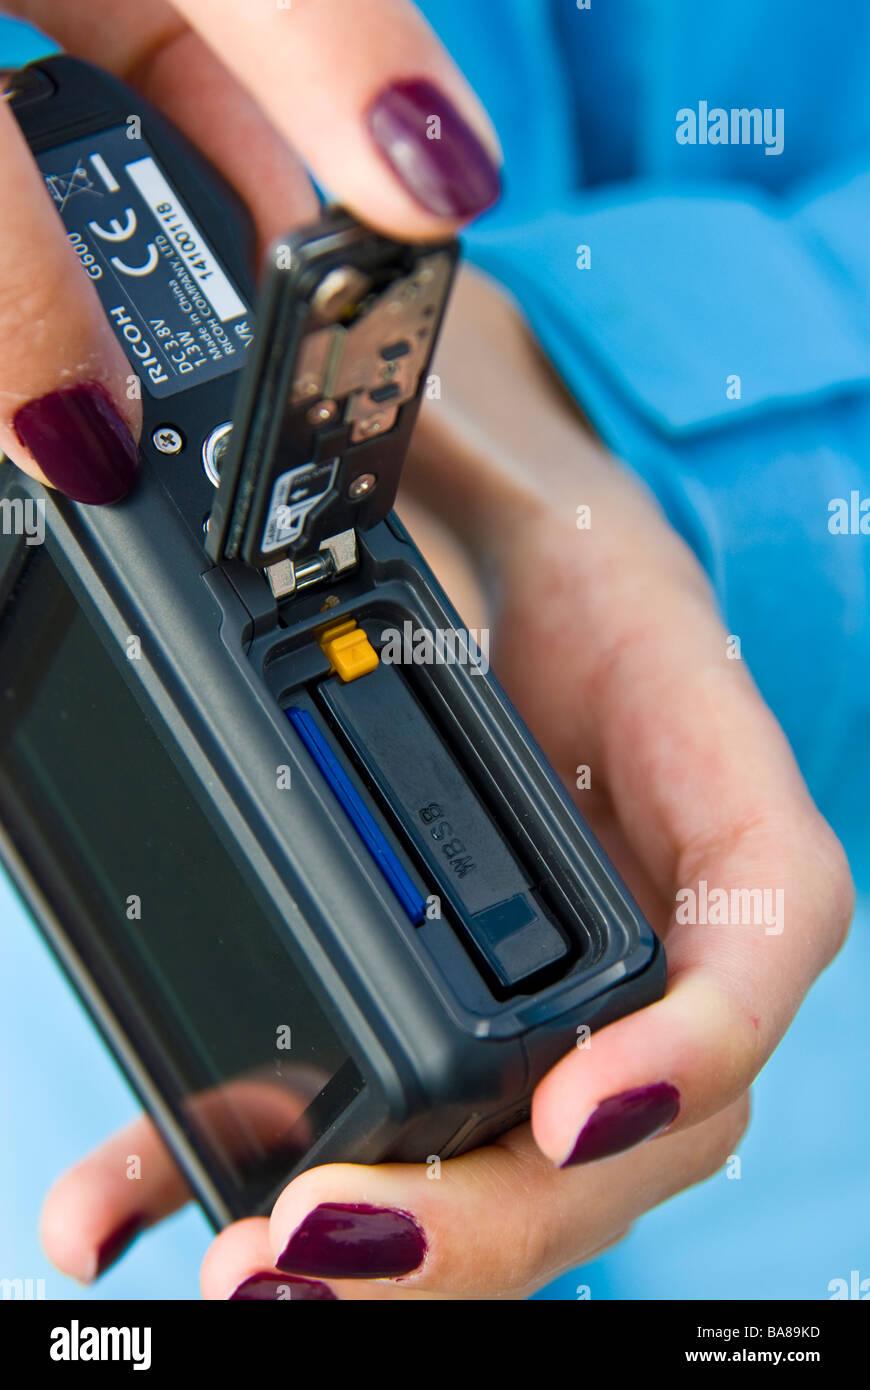 Mädchen kompakte Digitalkamera mit Akku und Speicher-Chip-Karte | Finger-Batterie Chipkarte Digitale Kompakt Stockbild